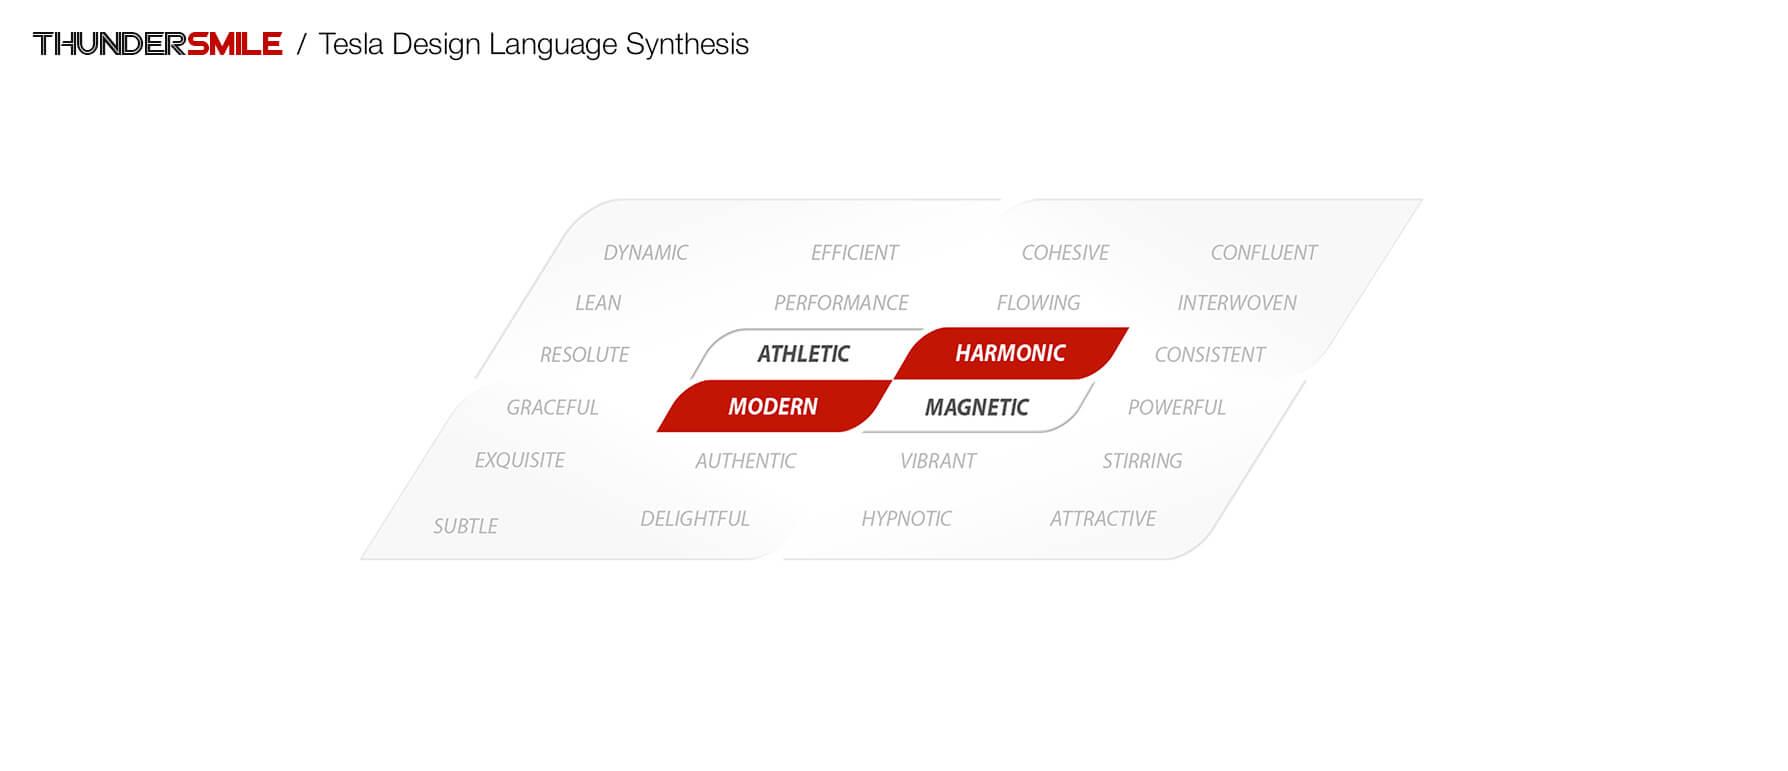 thundersmile-tesla-design-language-synthesis